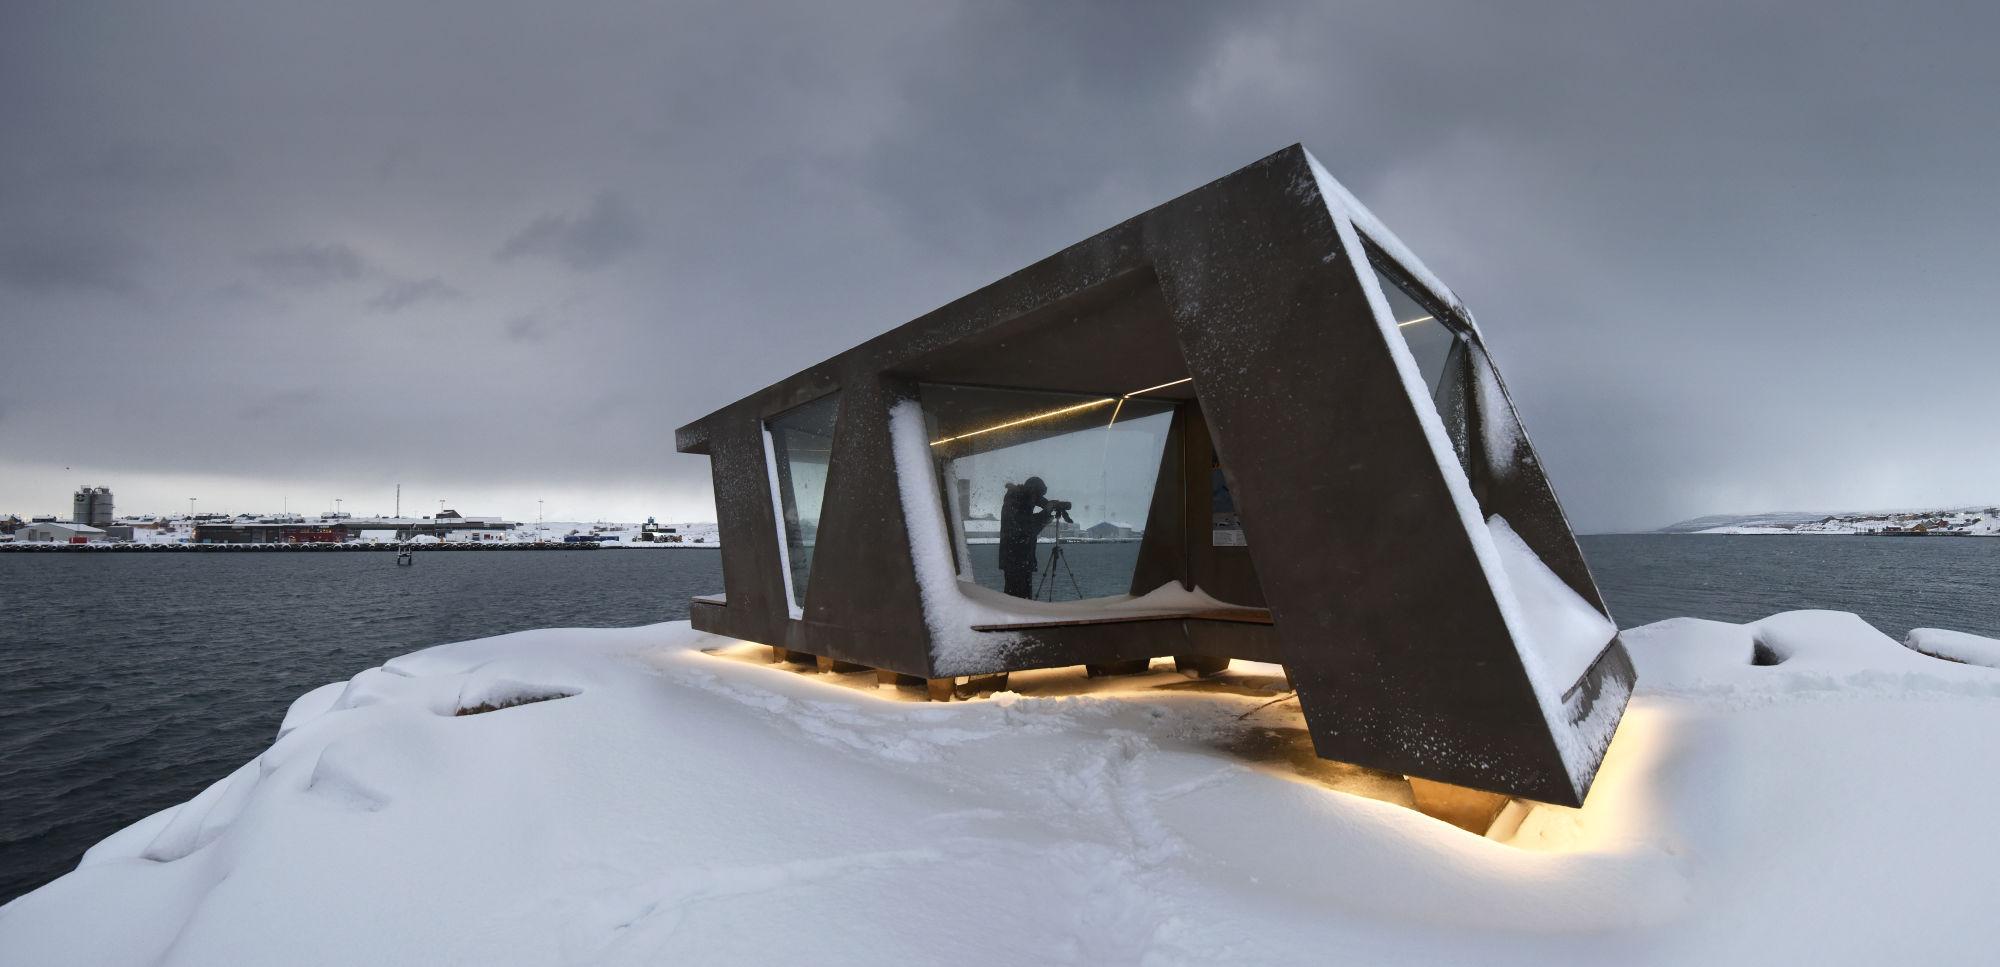 Swarovski Optik Telescope nature Vadsø breakwater bird hide molo wind shelter